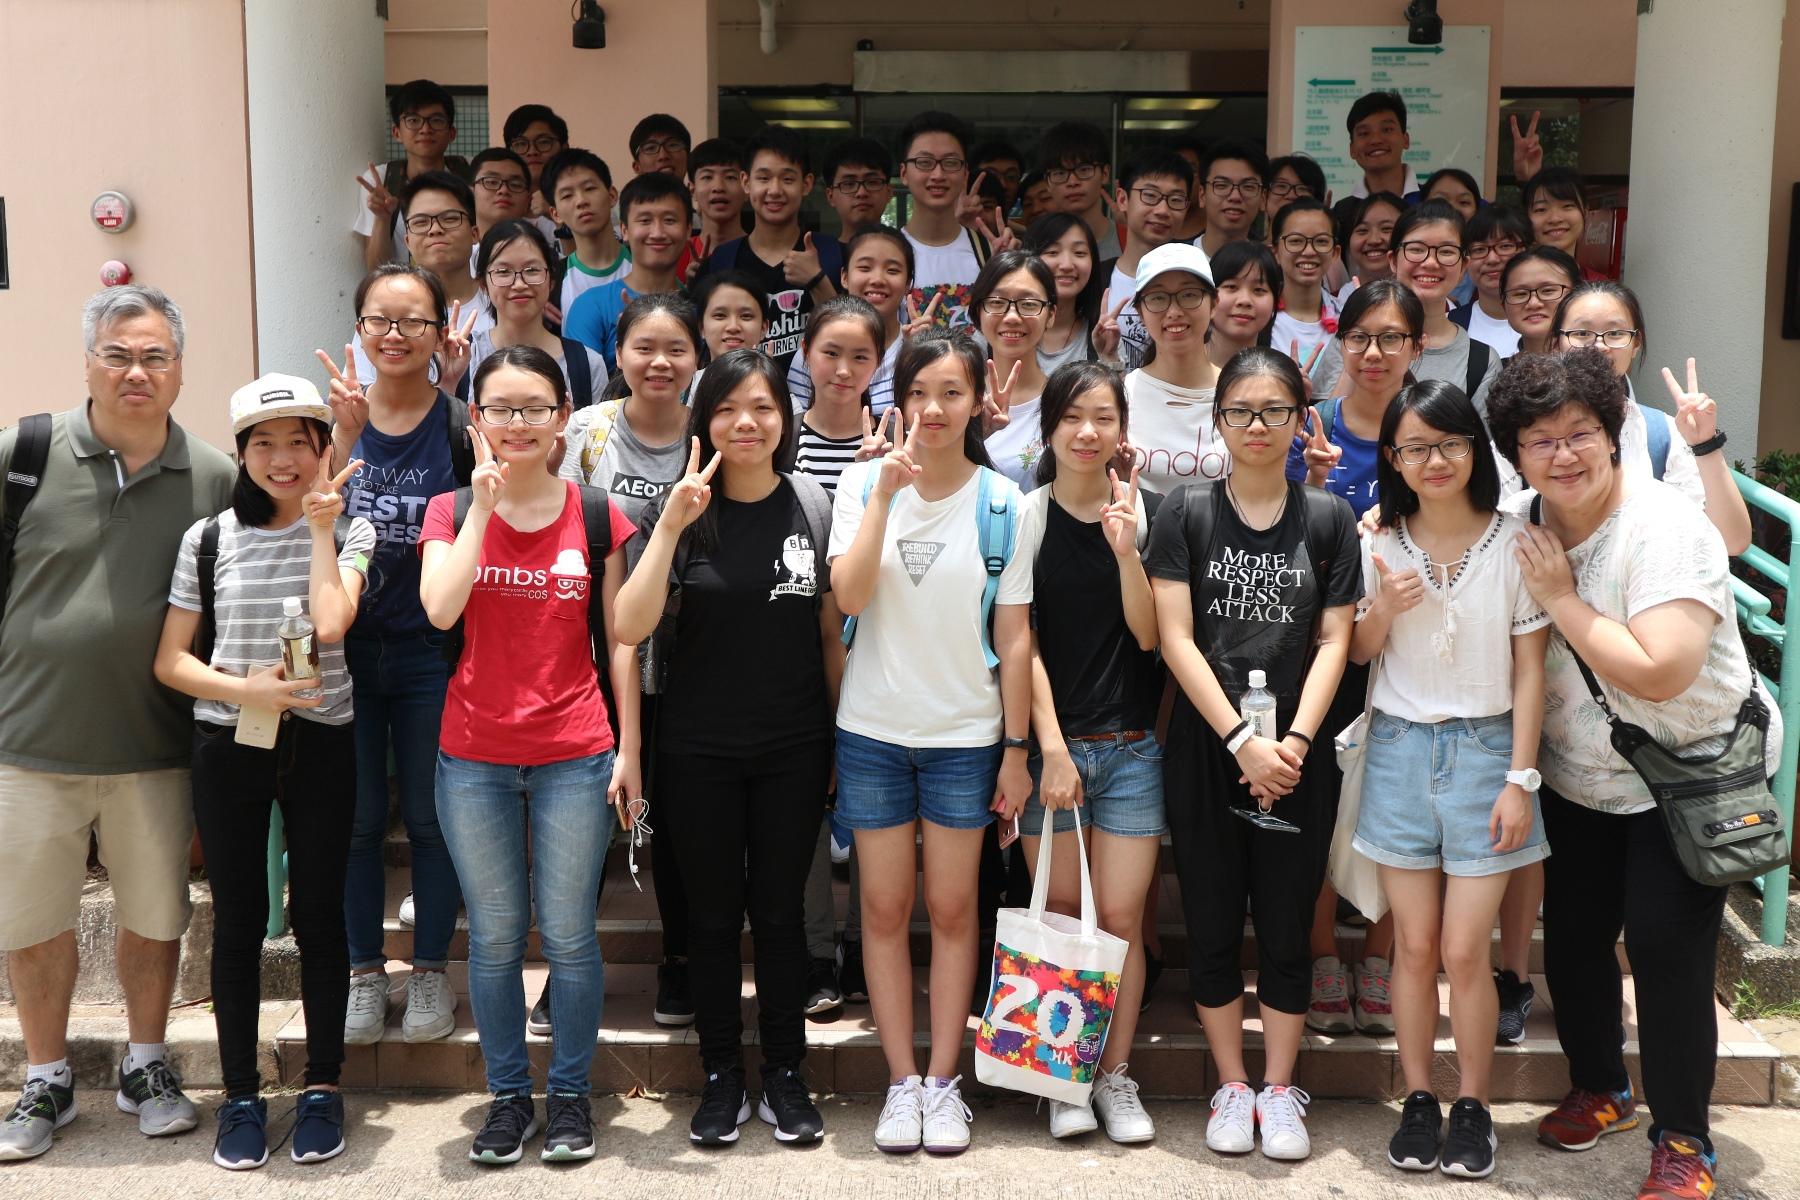 http://www.npc.edu.hk/sites/default/files/img_3406.jpg